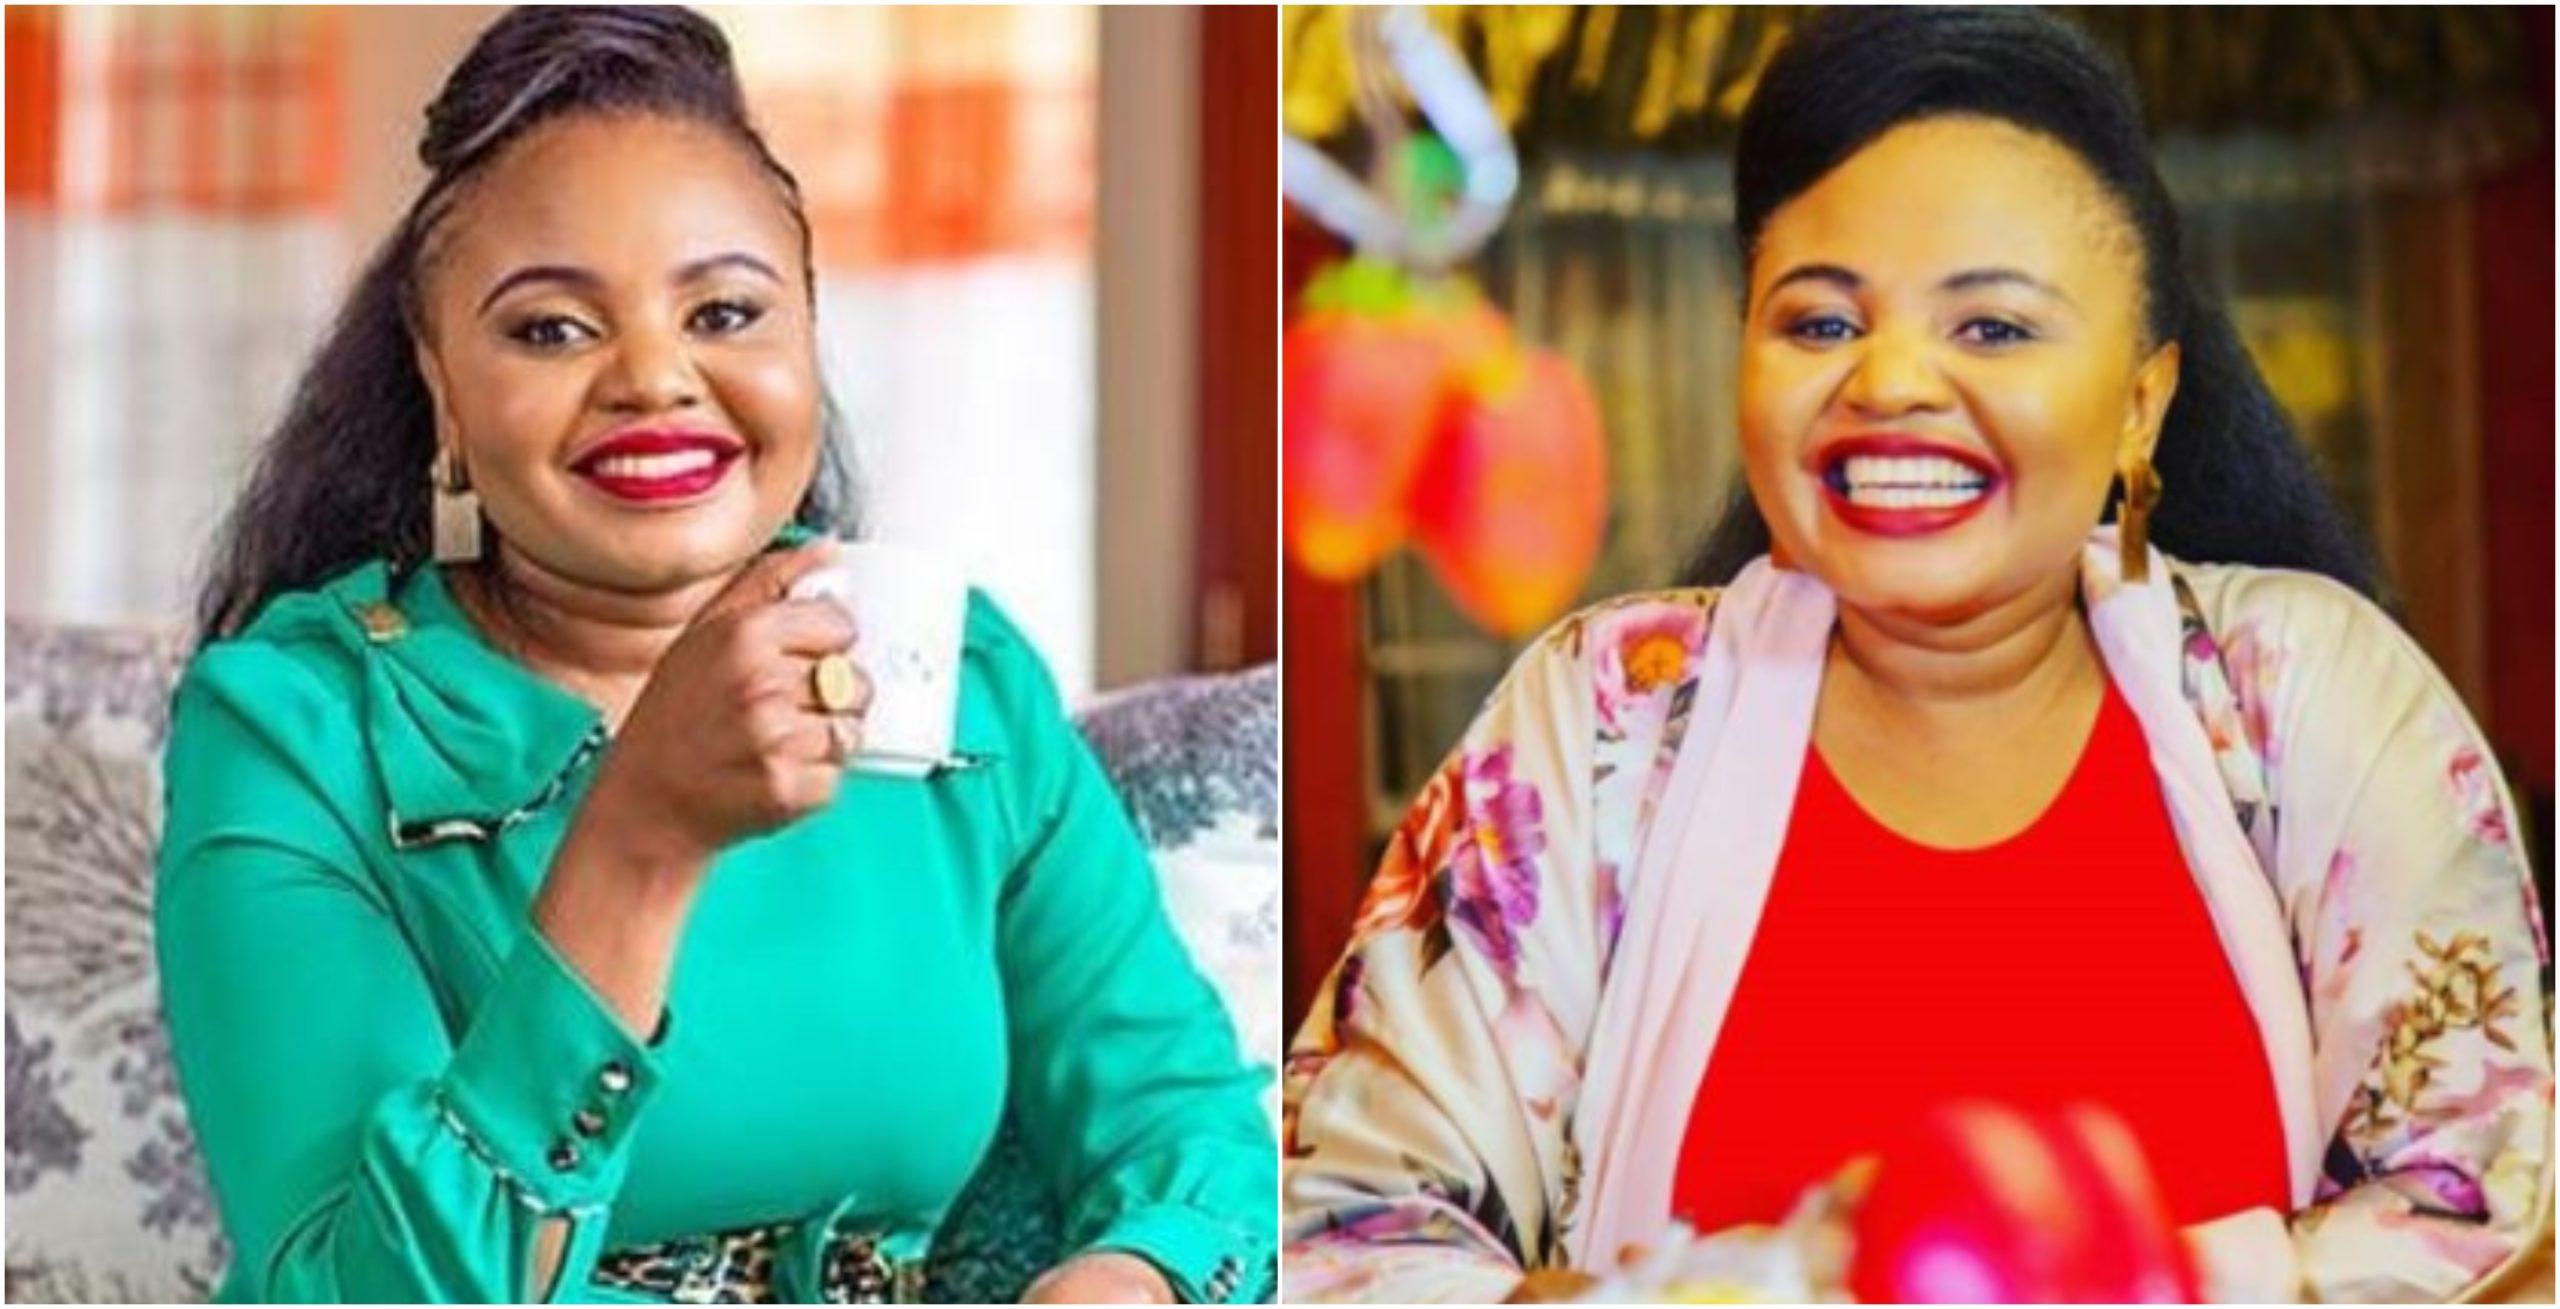 """Congratulations!"" Mwanaisha Chidzuga seemingly mocks K24 employees fired through night SMS"